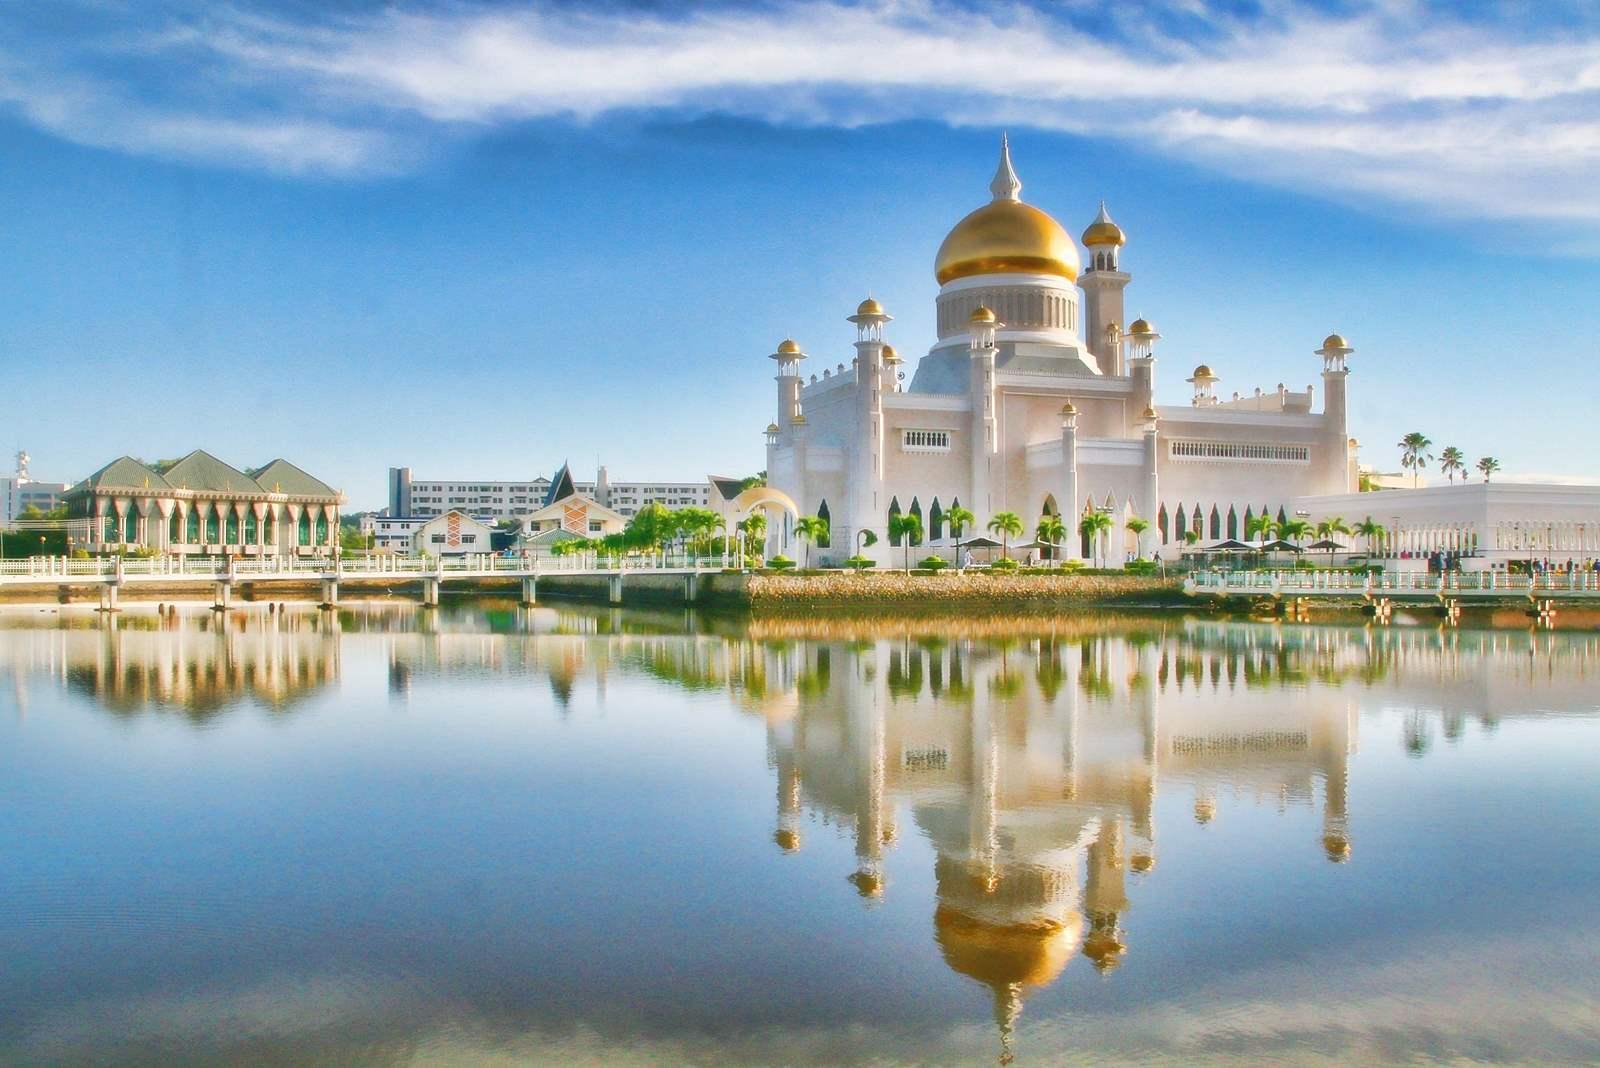 Bandar Seri Begawan city